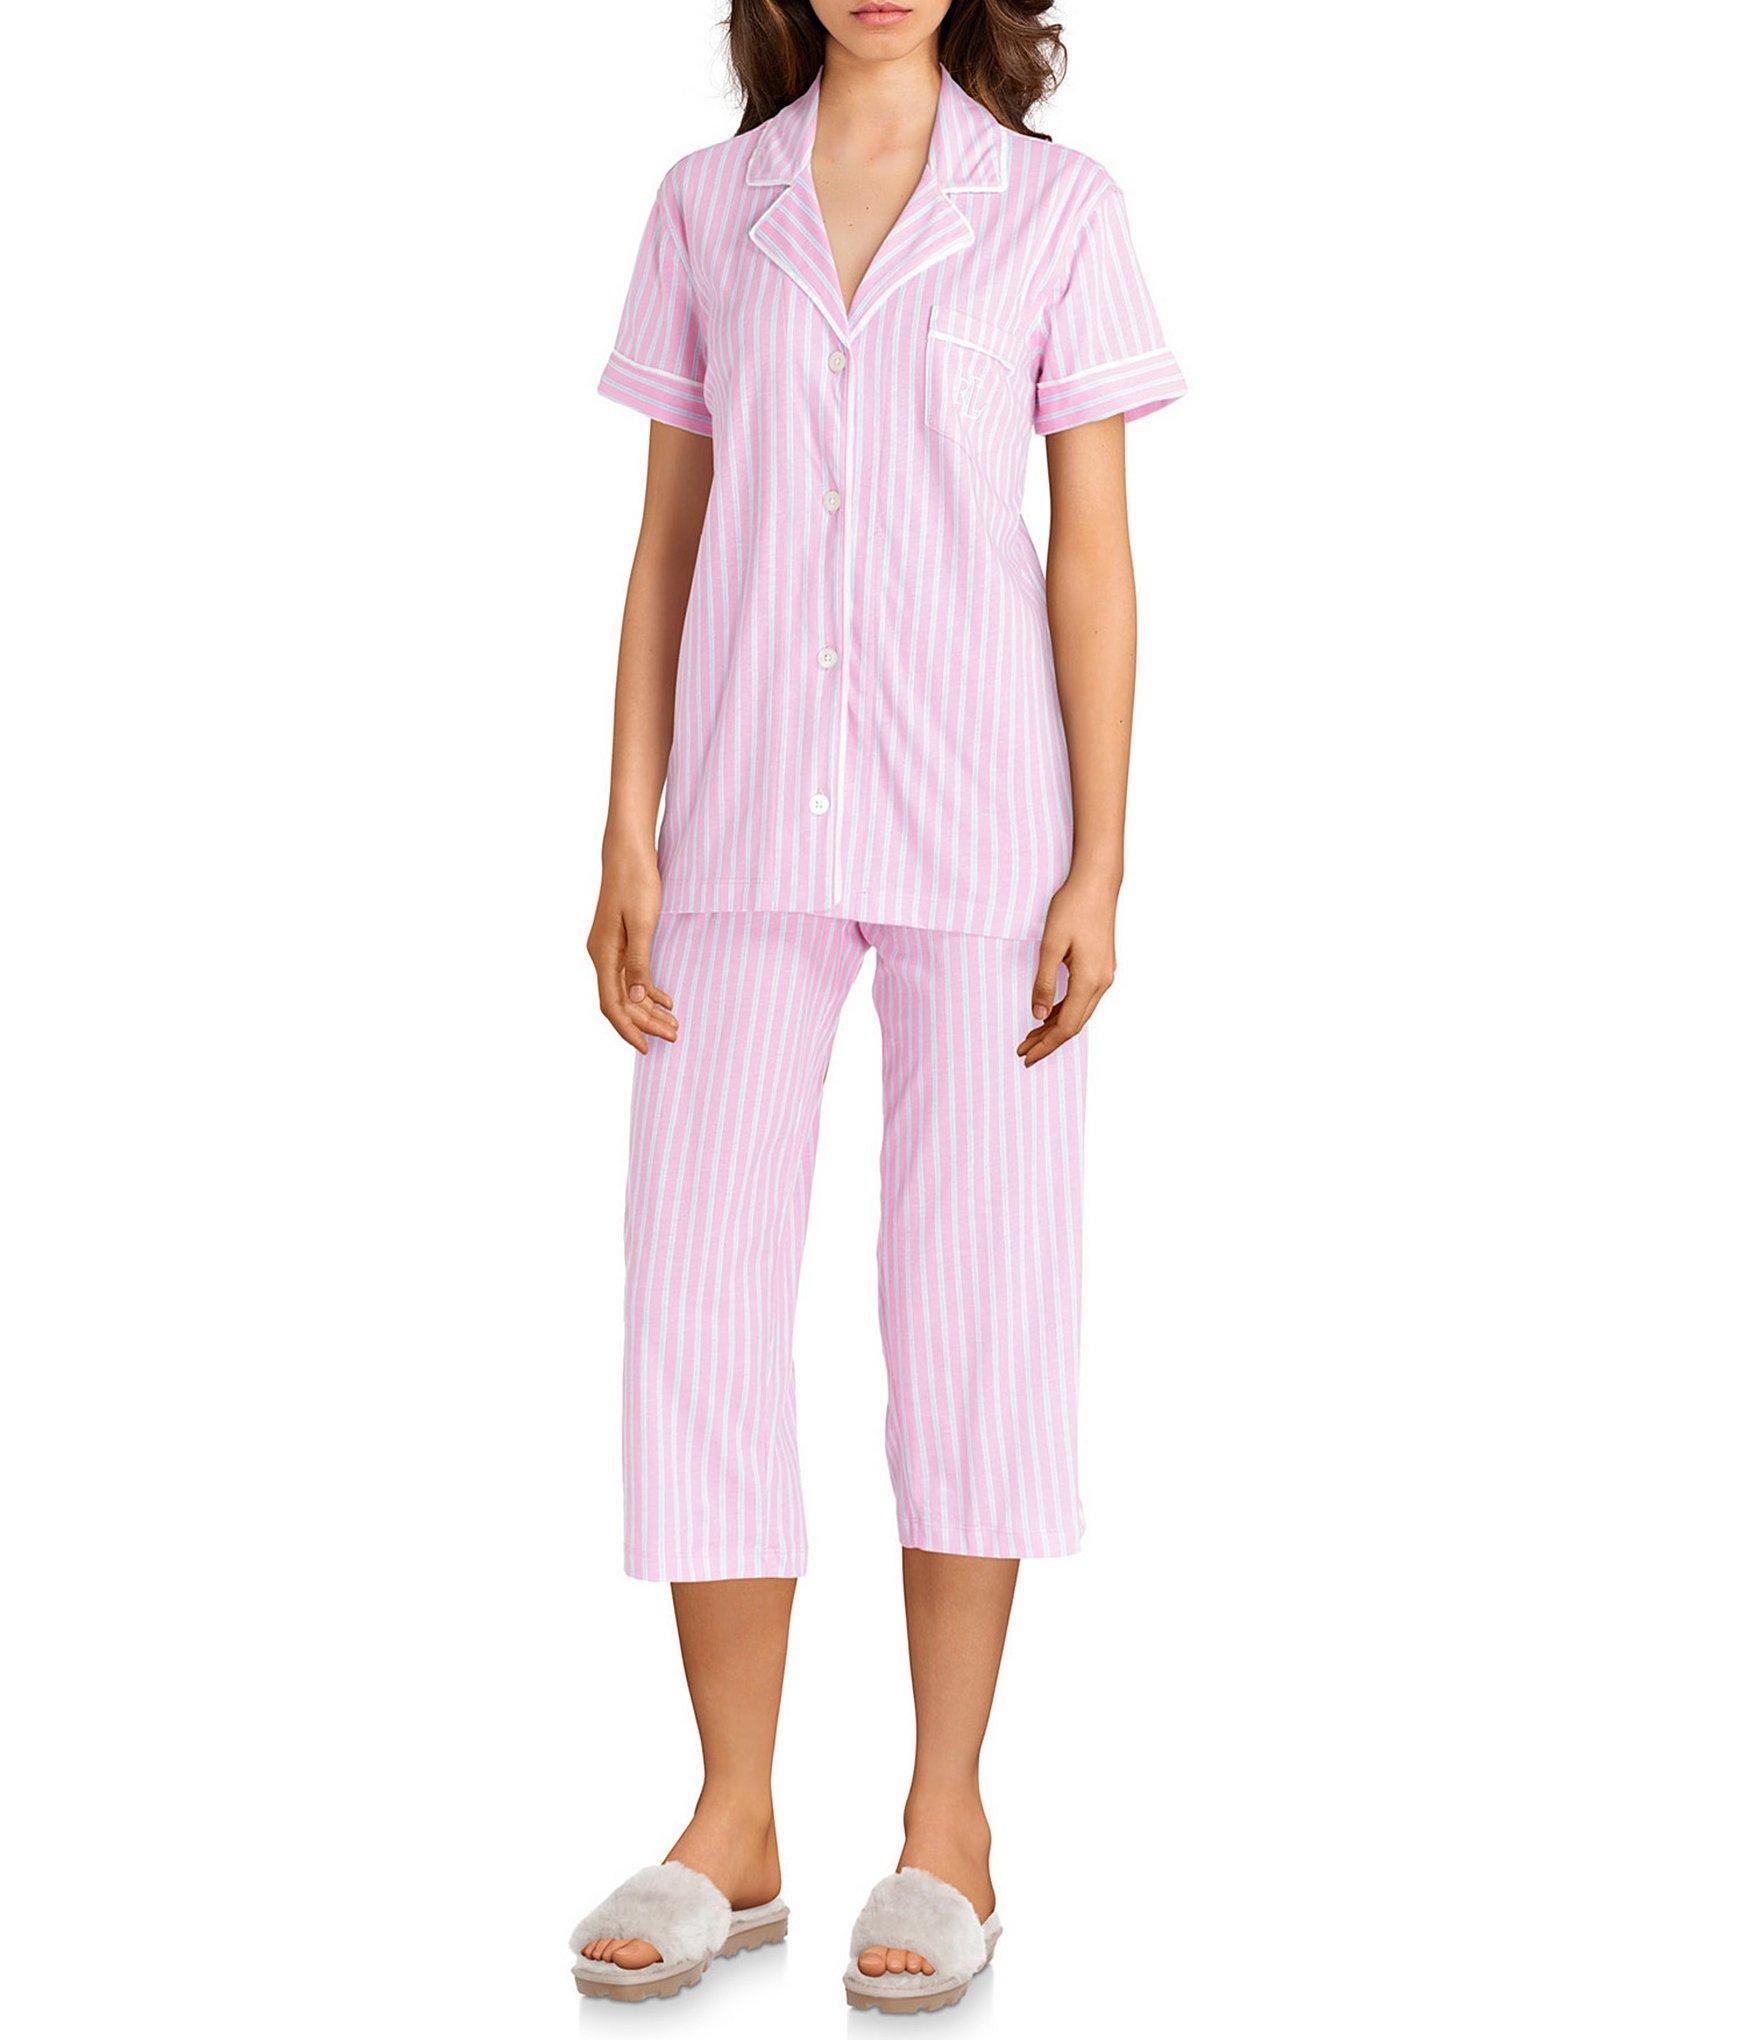 a493c50761e Lauren by Ralph Lauren. Women s Pink Striped-printed Knit Capri Pajama Set